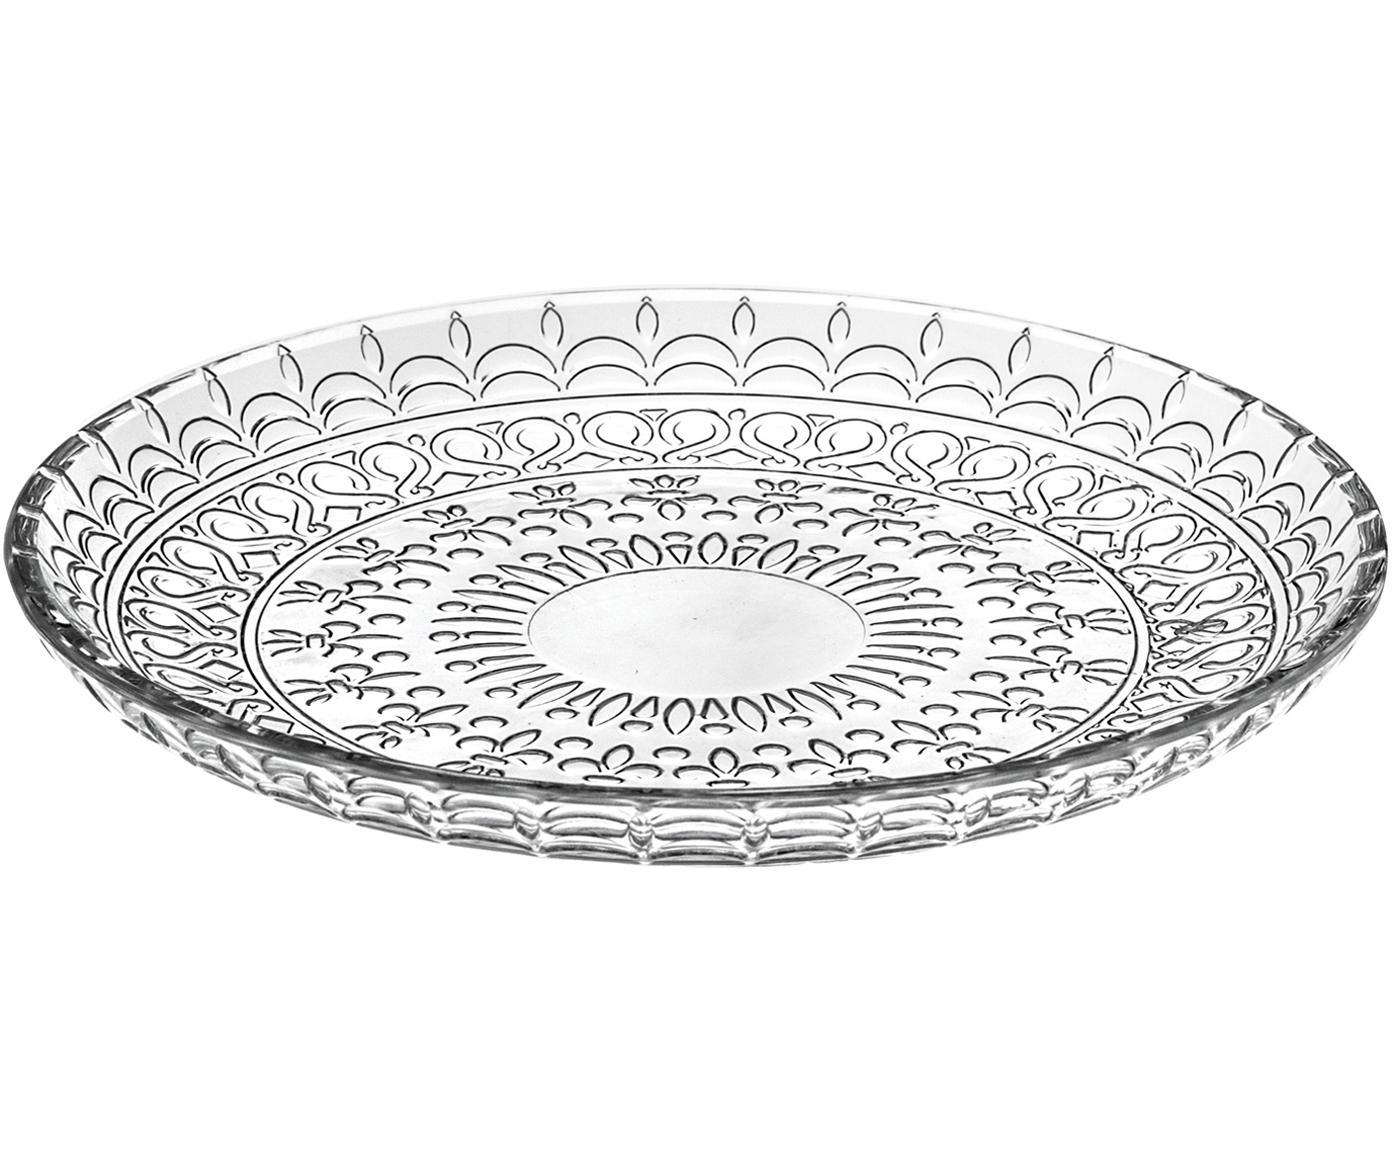 Kristall-Dessertteller Fondo, 4 Stück, Luxion-Kristallglas, Transparent, Ø 21 cm